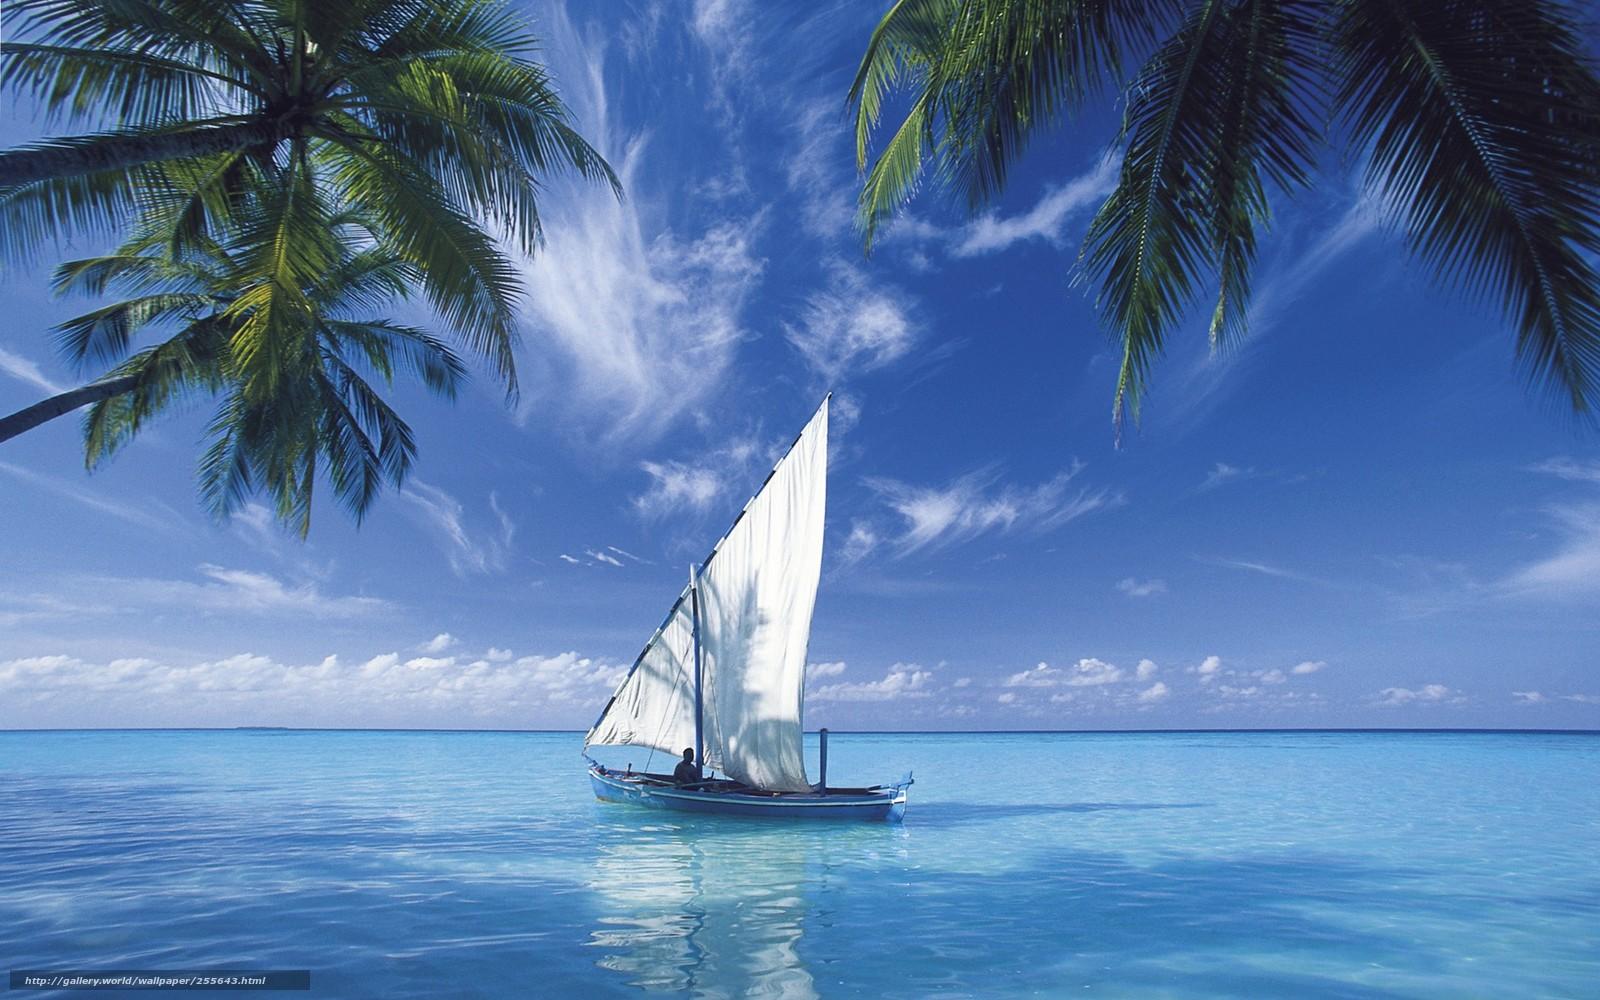 Скачать на телефон обои фото картинку на тему пейзажи, море, океан, красиво, разширение 1920x1200